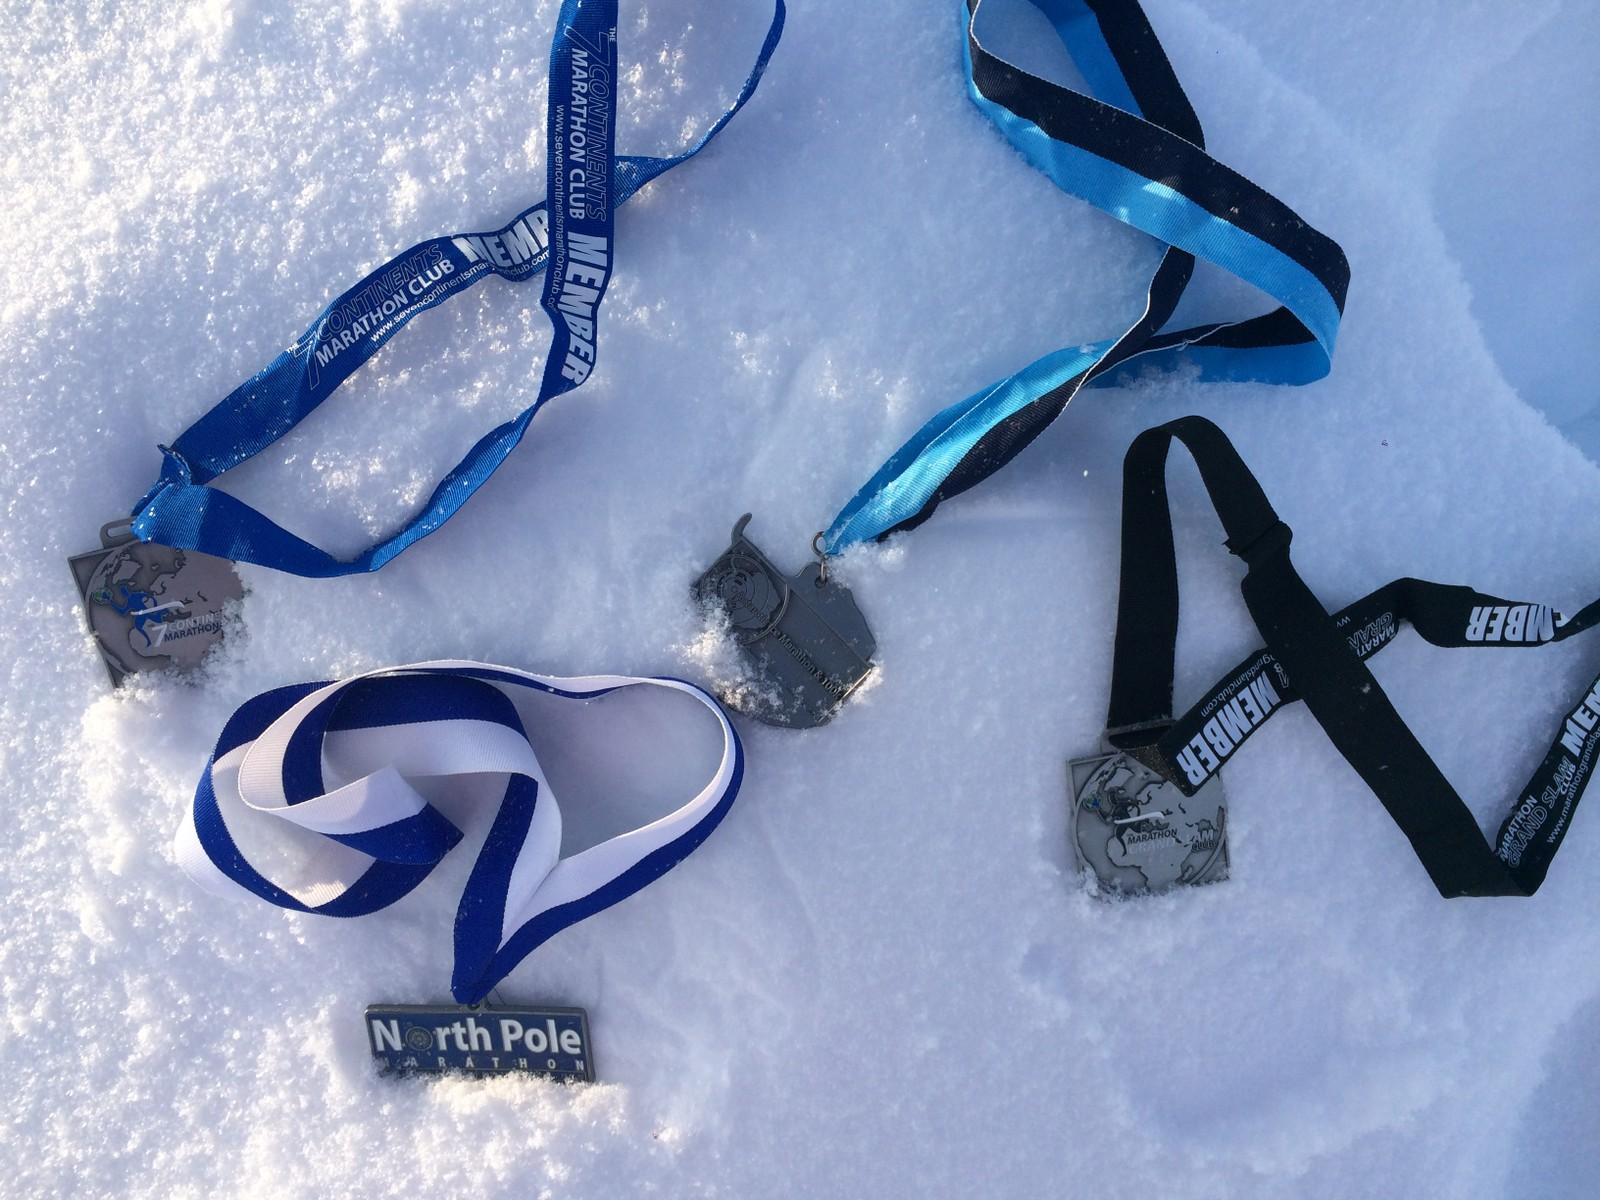 Medaljer fra Antarctic Ice Marathon, North Pole Marathon, The Seven Continents Marathon Club og Grand Slam. Den siste er for å ha løpt på alle sju kontinenter + Nordpolen.